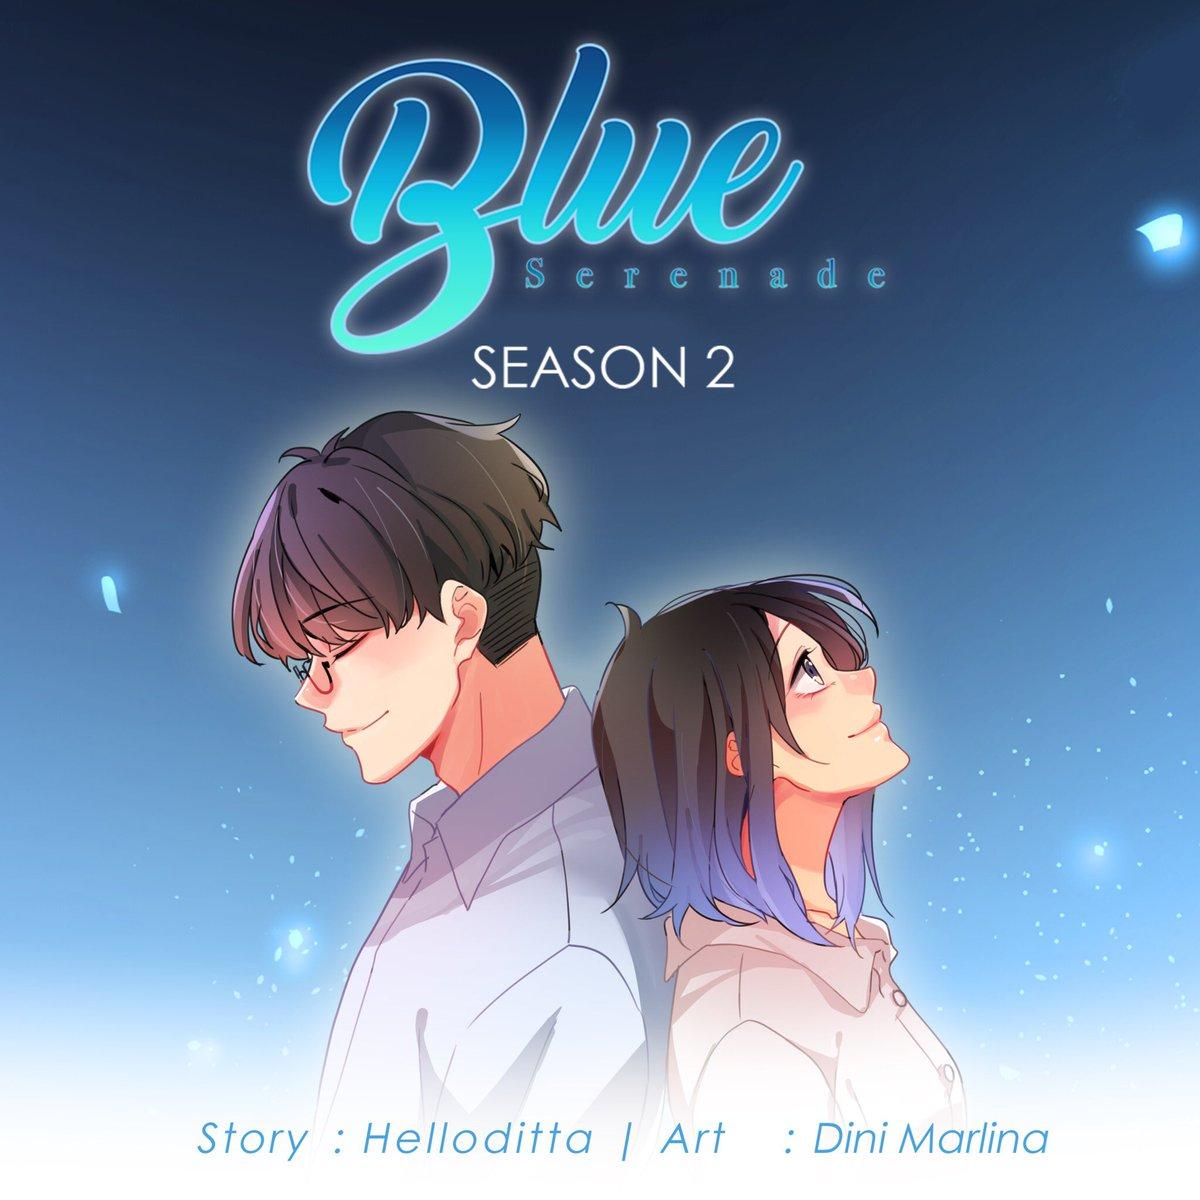 Besok. Baca season 1 nya di sini: ciayo.com/id/comic/blue-…